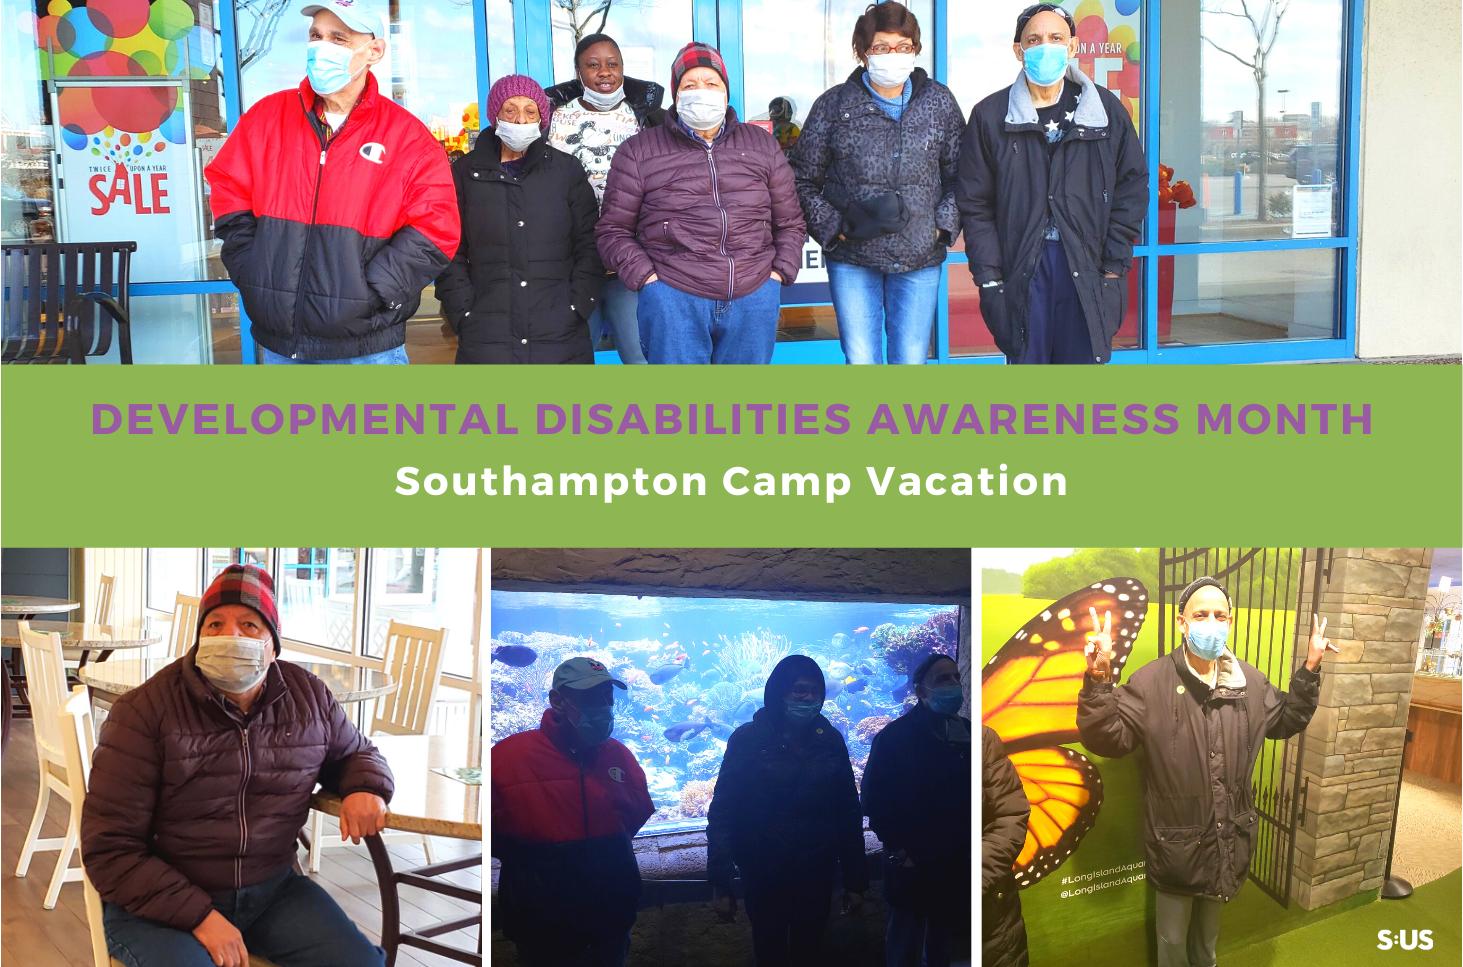 Southampton Camp Vacation